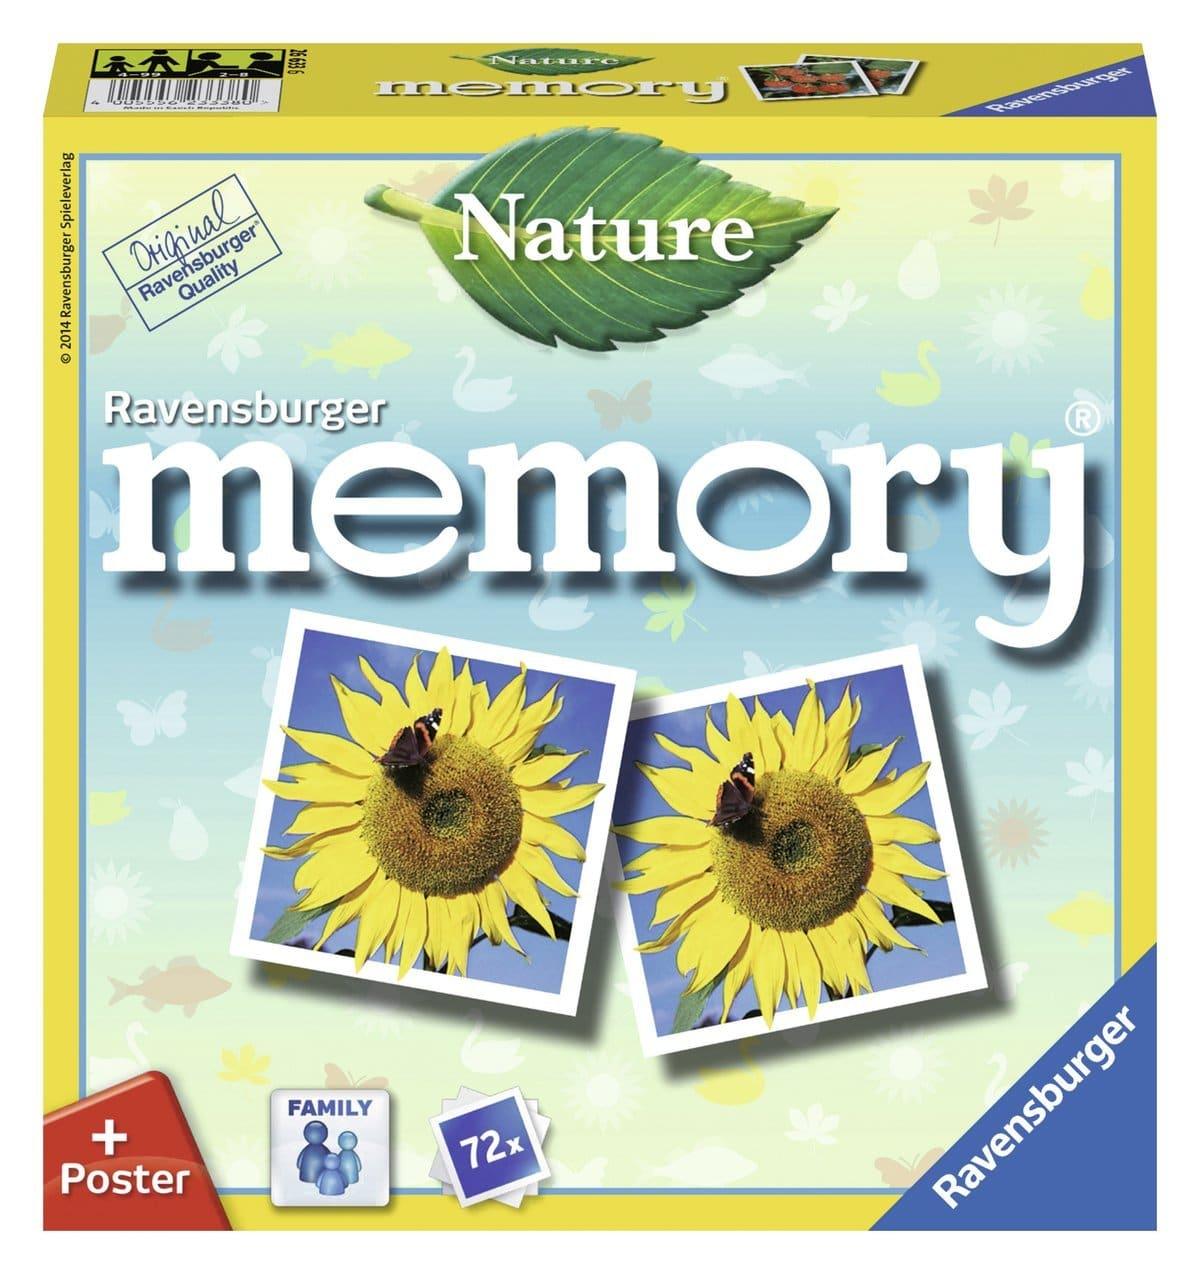 Memory Spiele FГјr Senioren